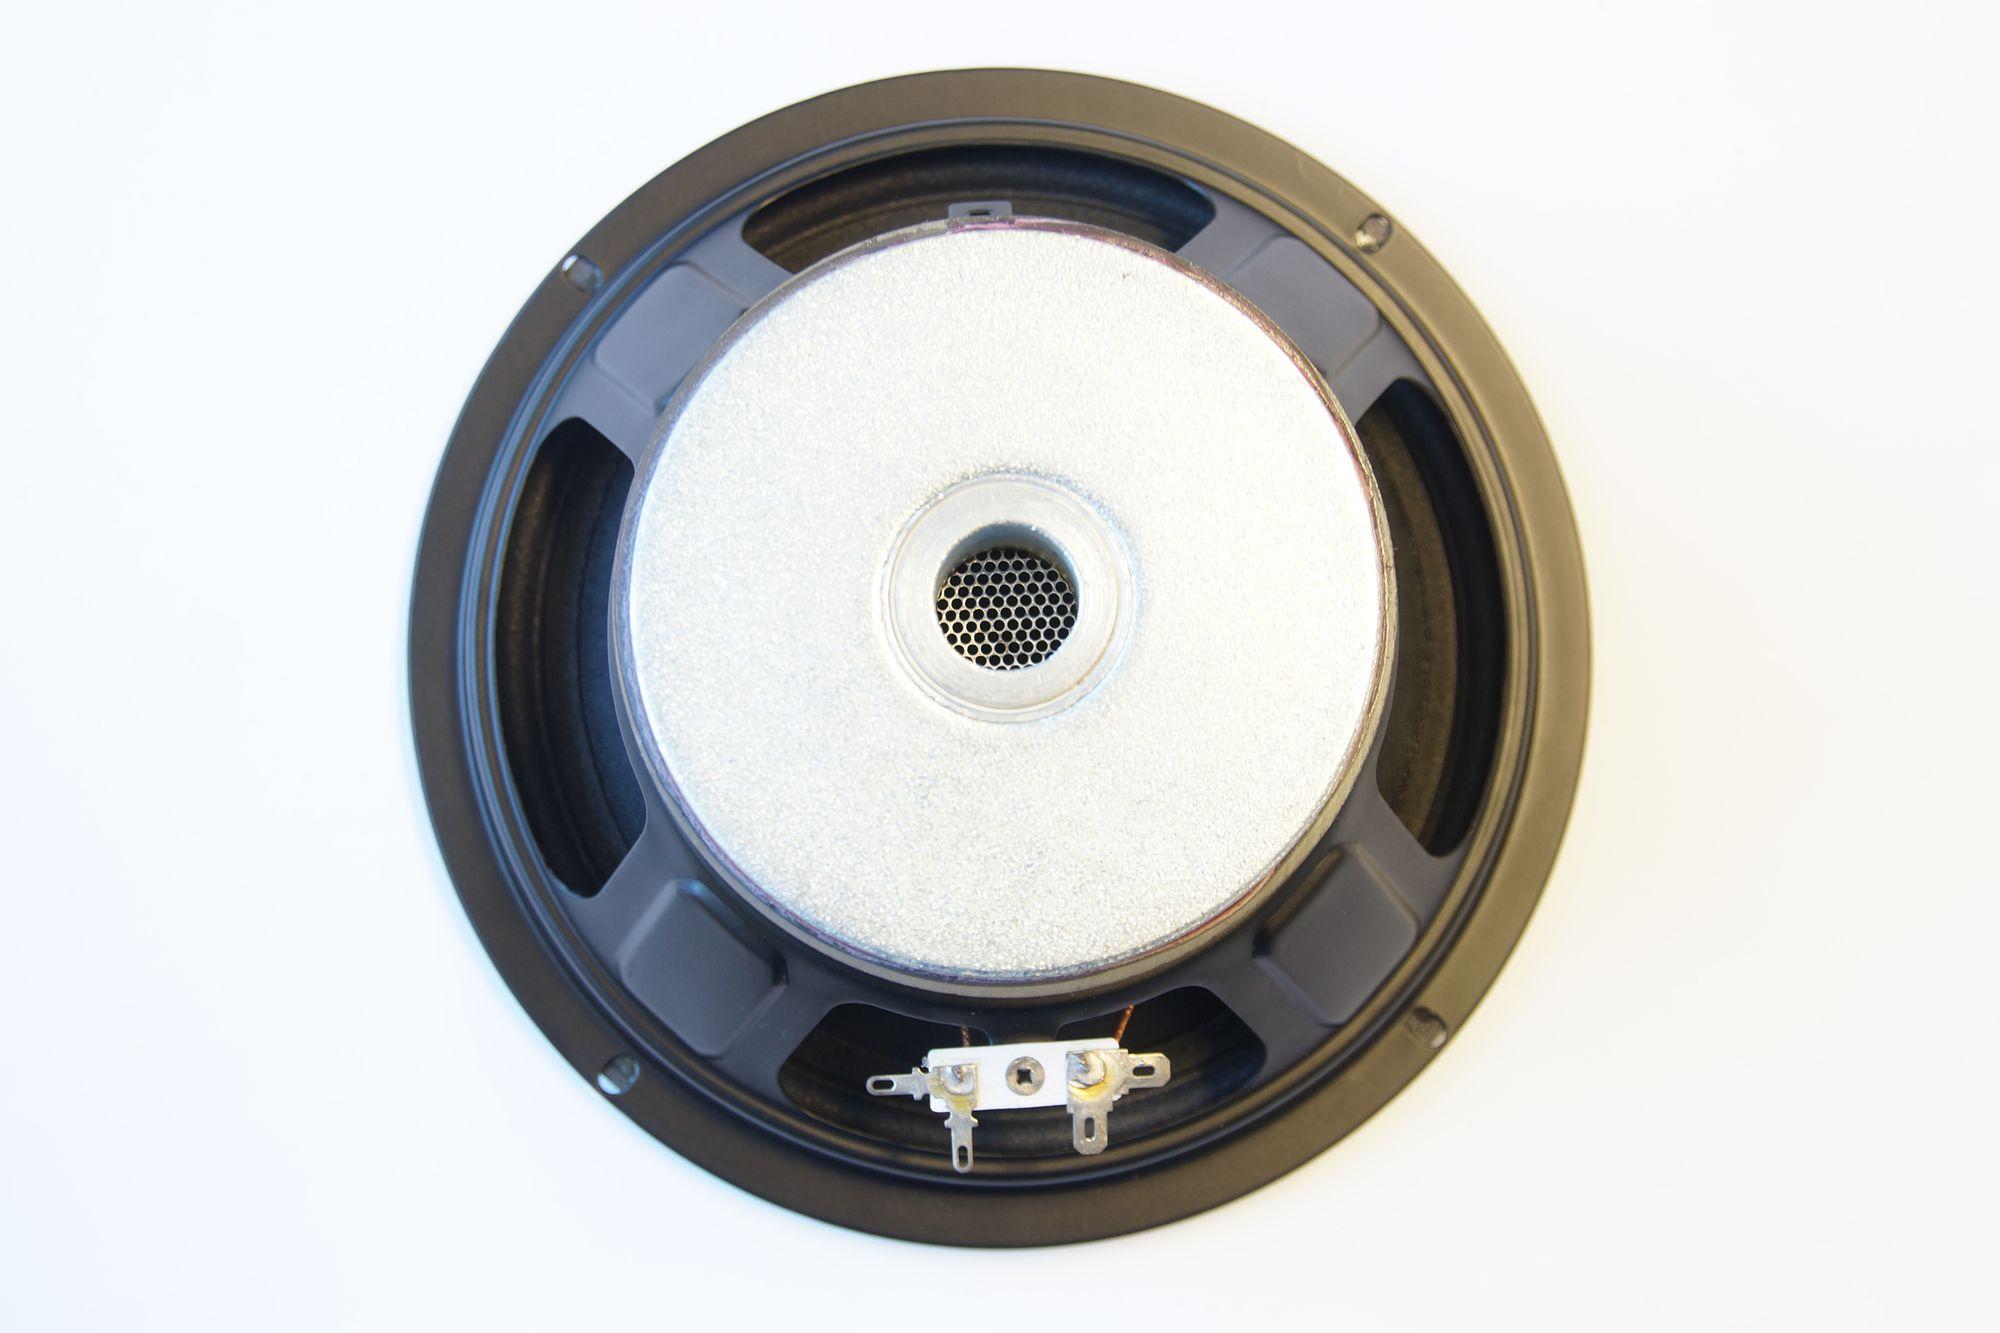 Subwoofer Tieftöner Basslautsprecher 20 cm Magnat Ultra Space – Bild 3